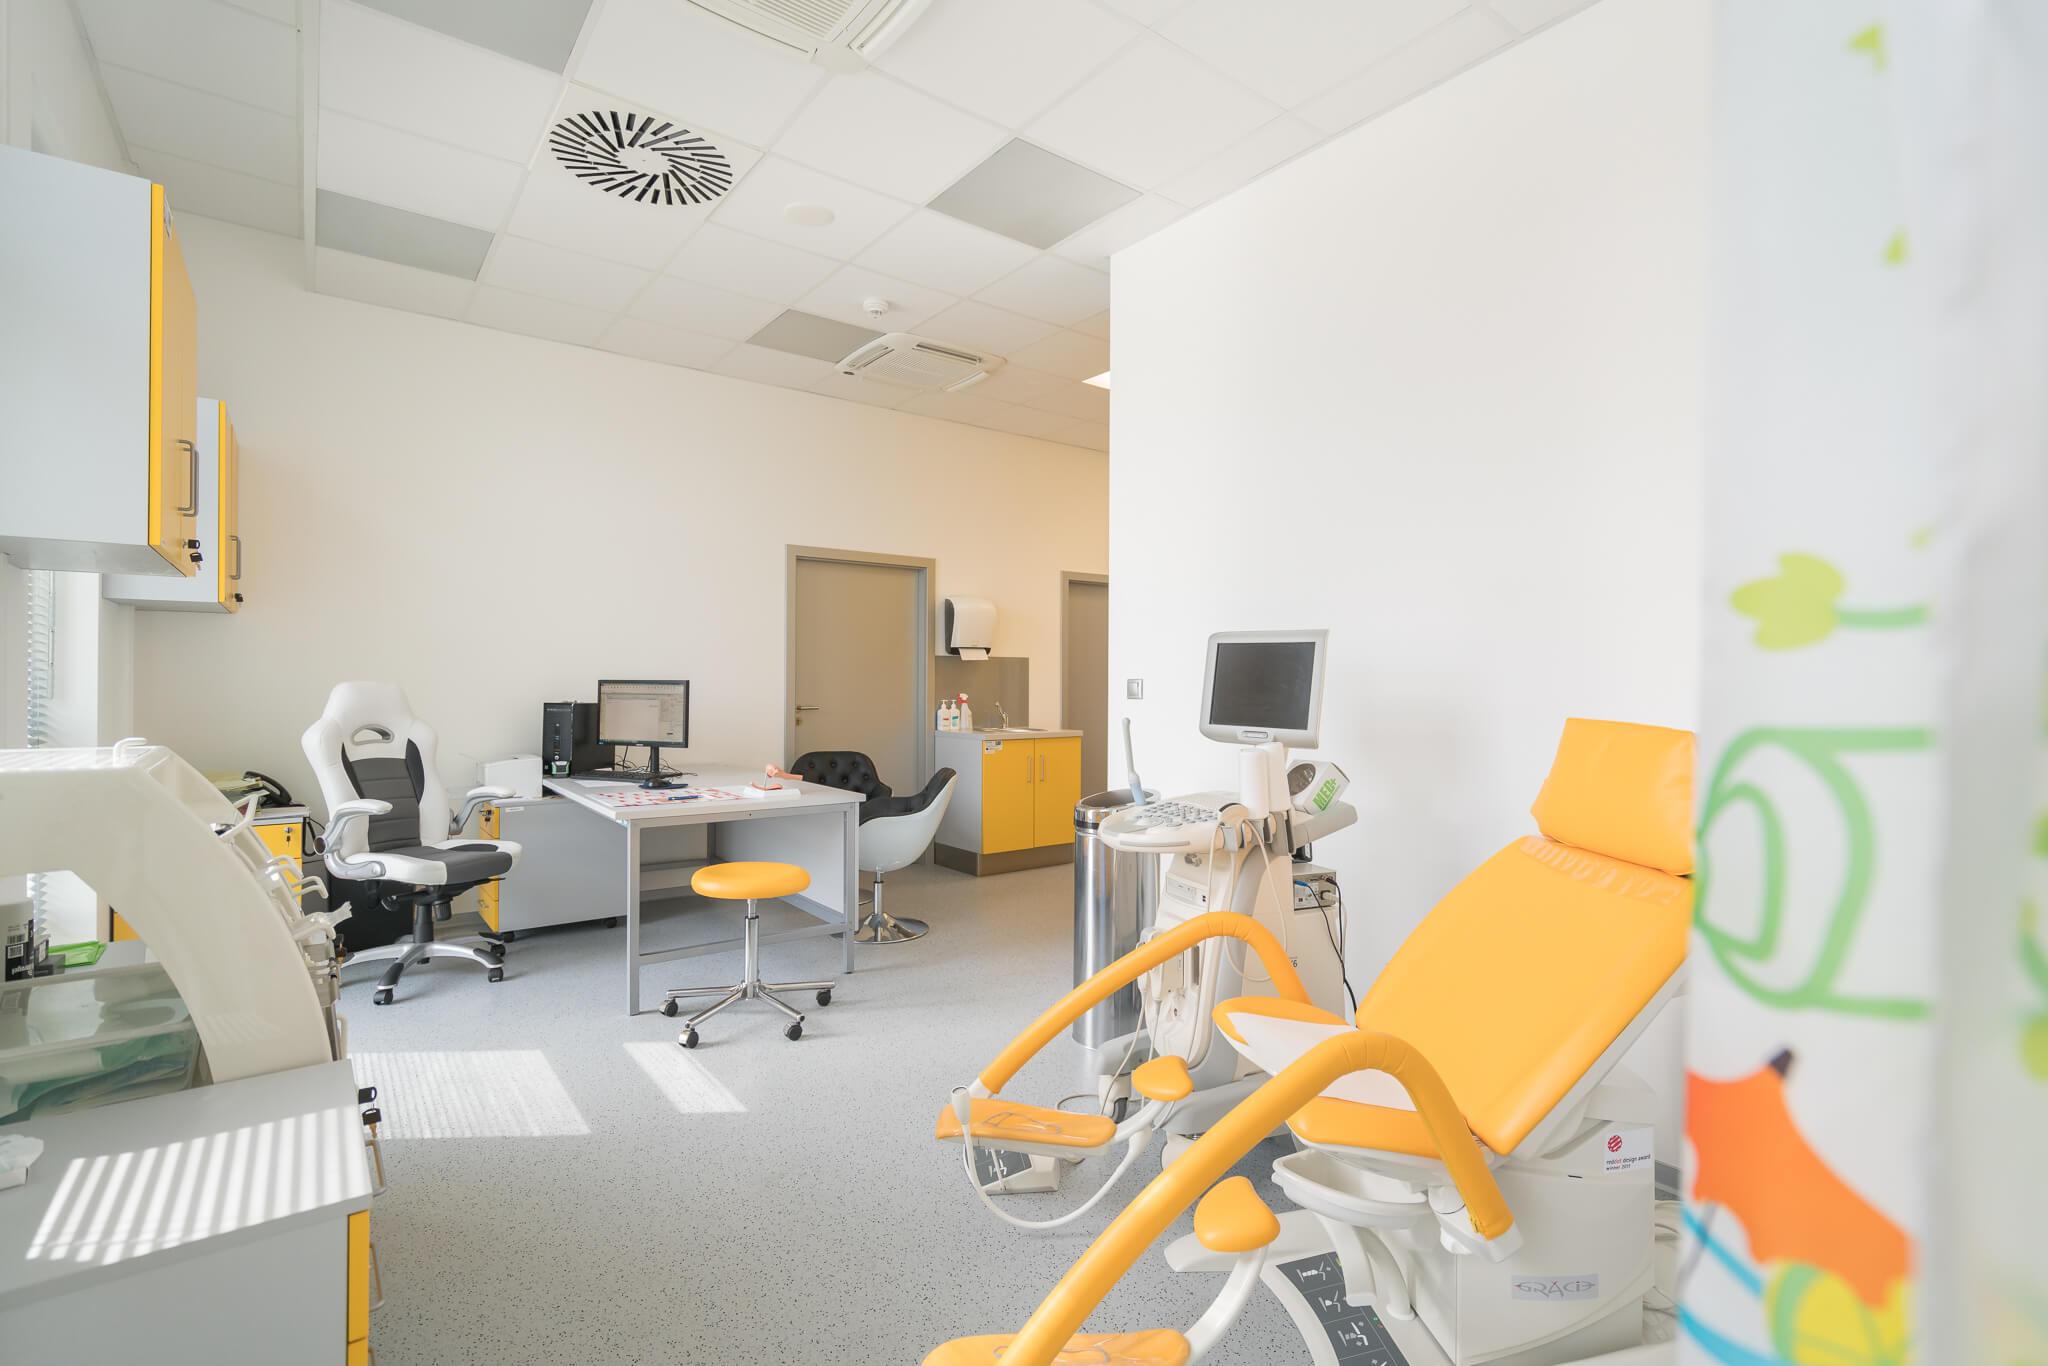 Klinika u Ostravi